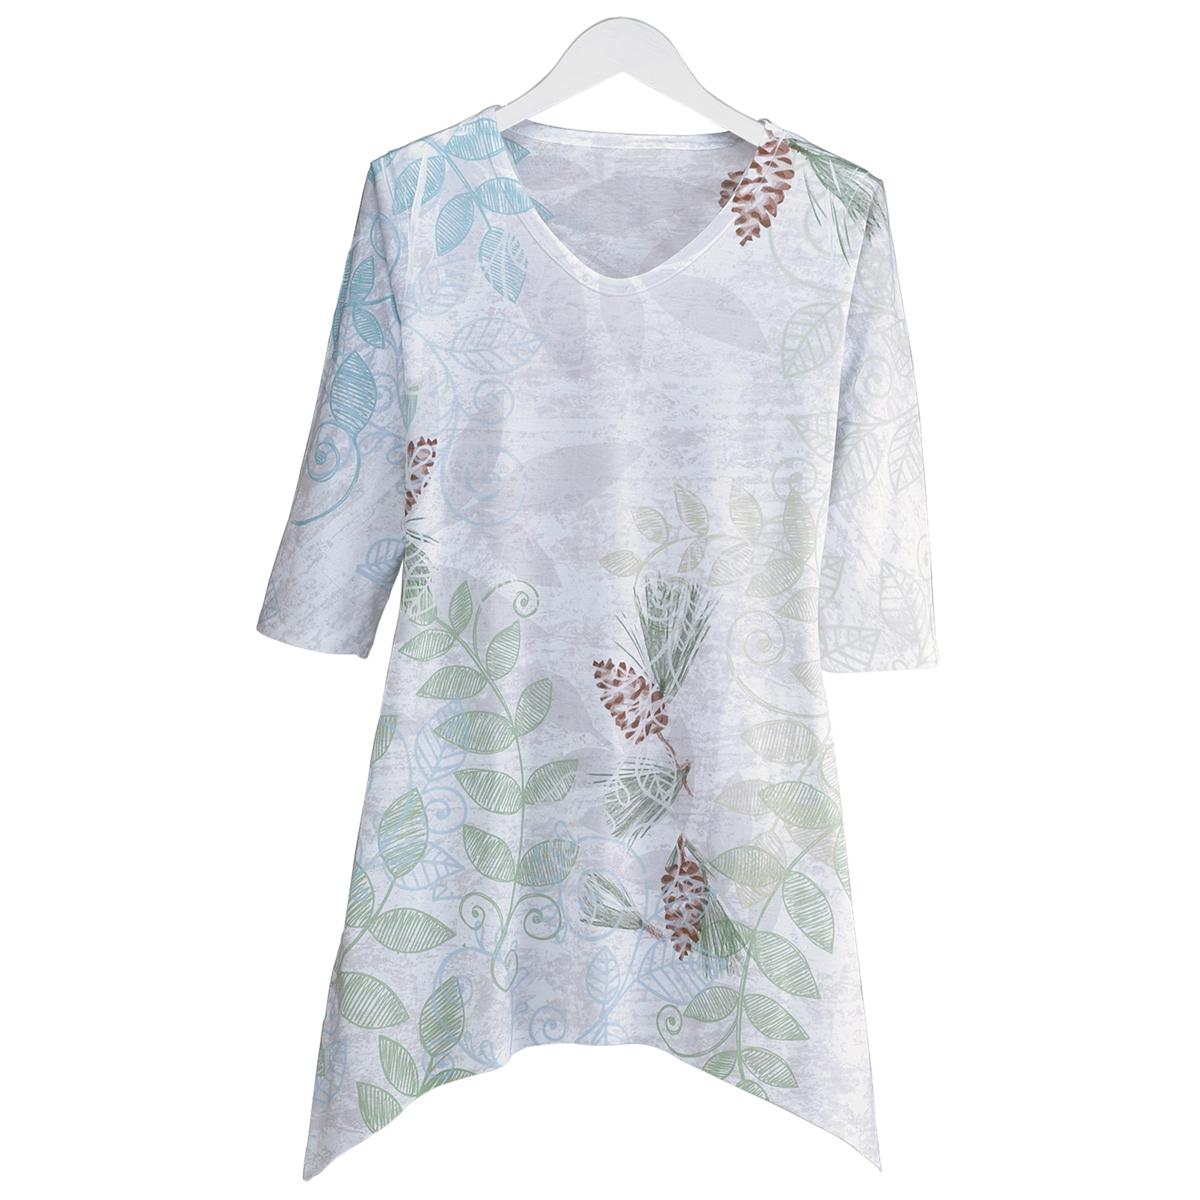 Flora Sublimated Fashion Tee